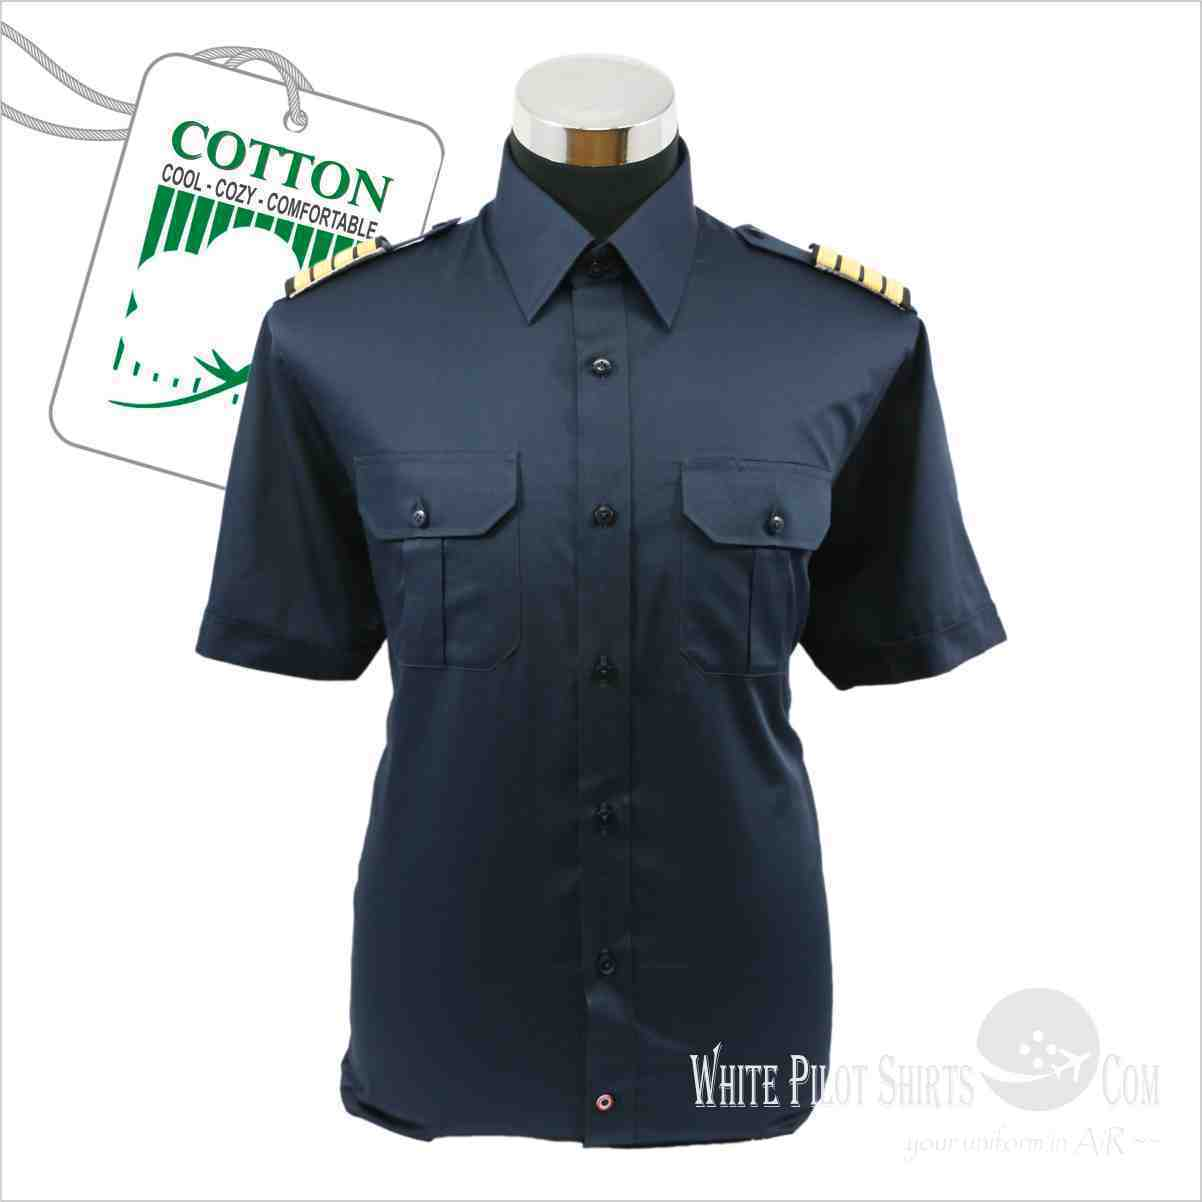 NAVY Blau Pilot Uniform Shirt Easy Care Aviator Helicopter pilots Cotton soft